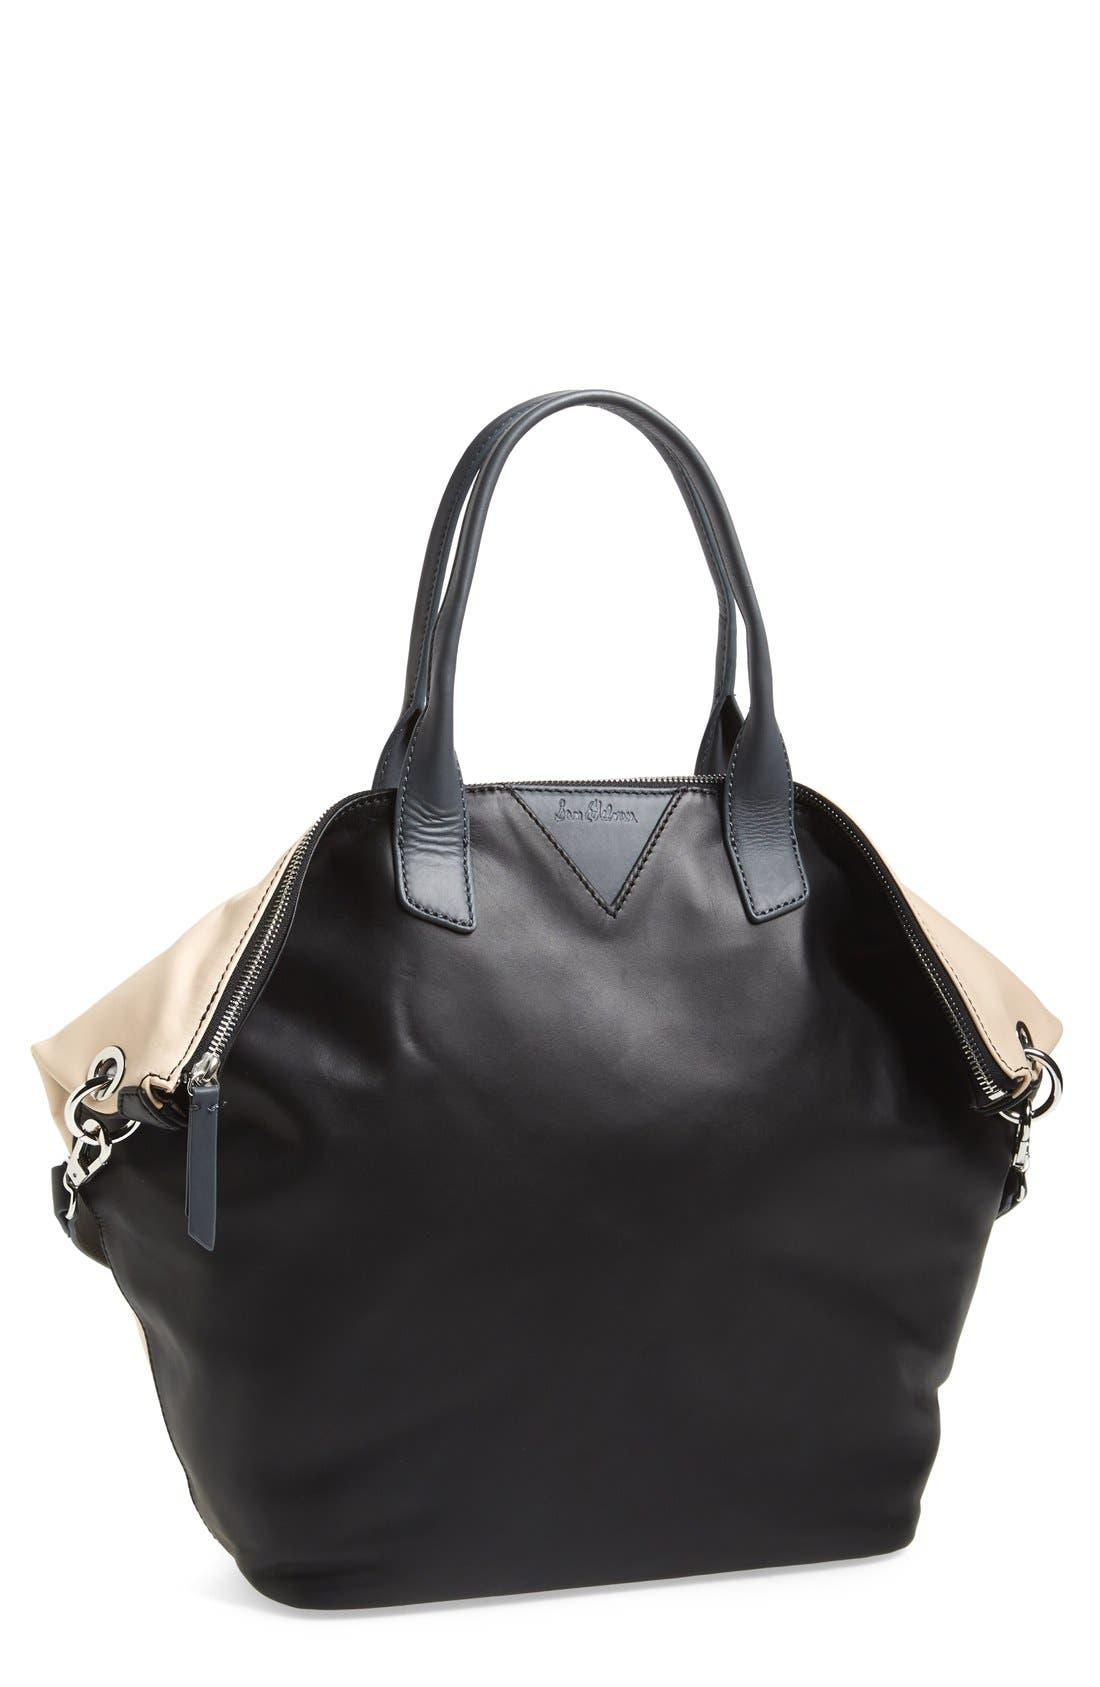 Alternate Image 1 Selected - Sam Edelman 'Sharp Graphic' Leather Satchel